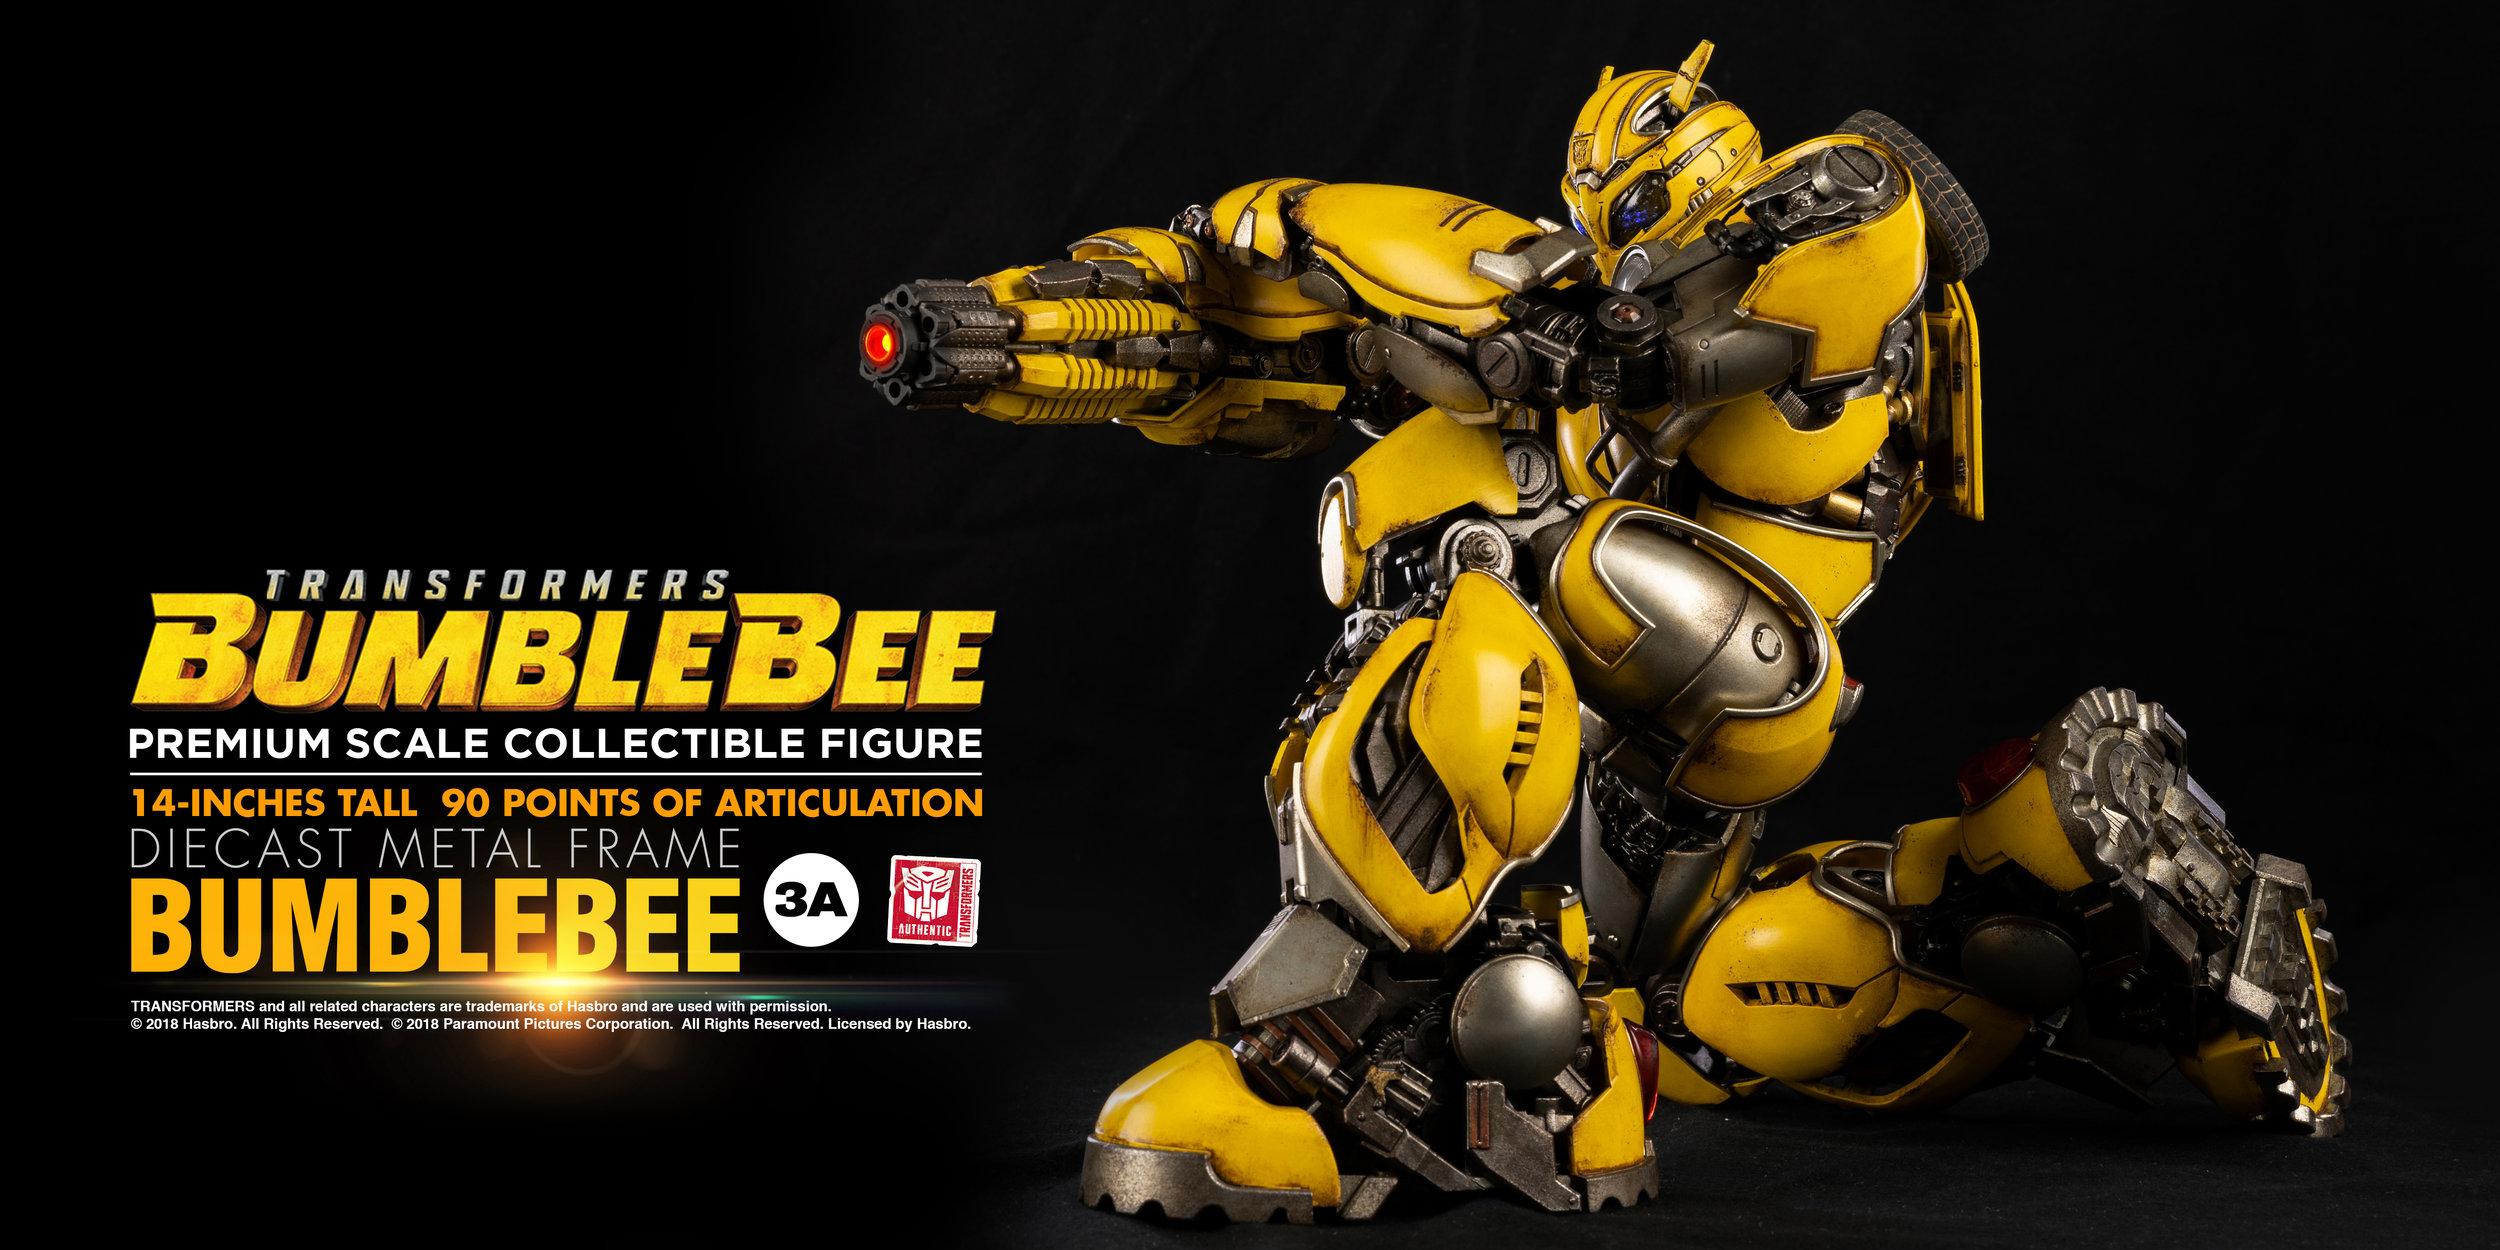 Bumblebee_ENG_PM_WIDE_008.jpg